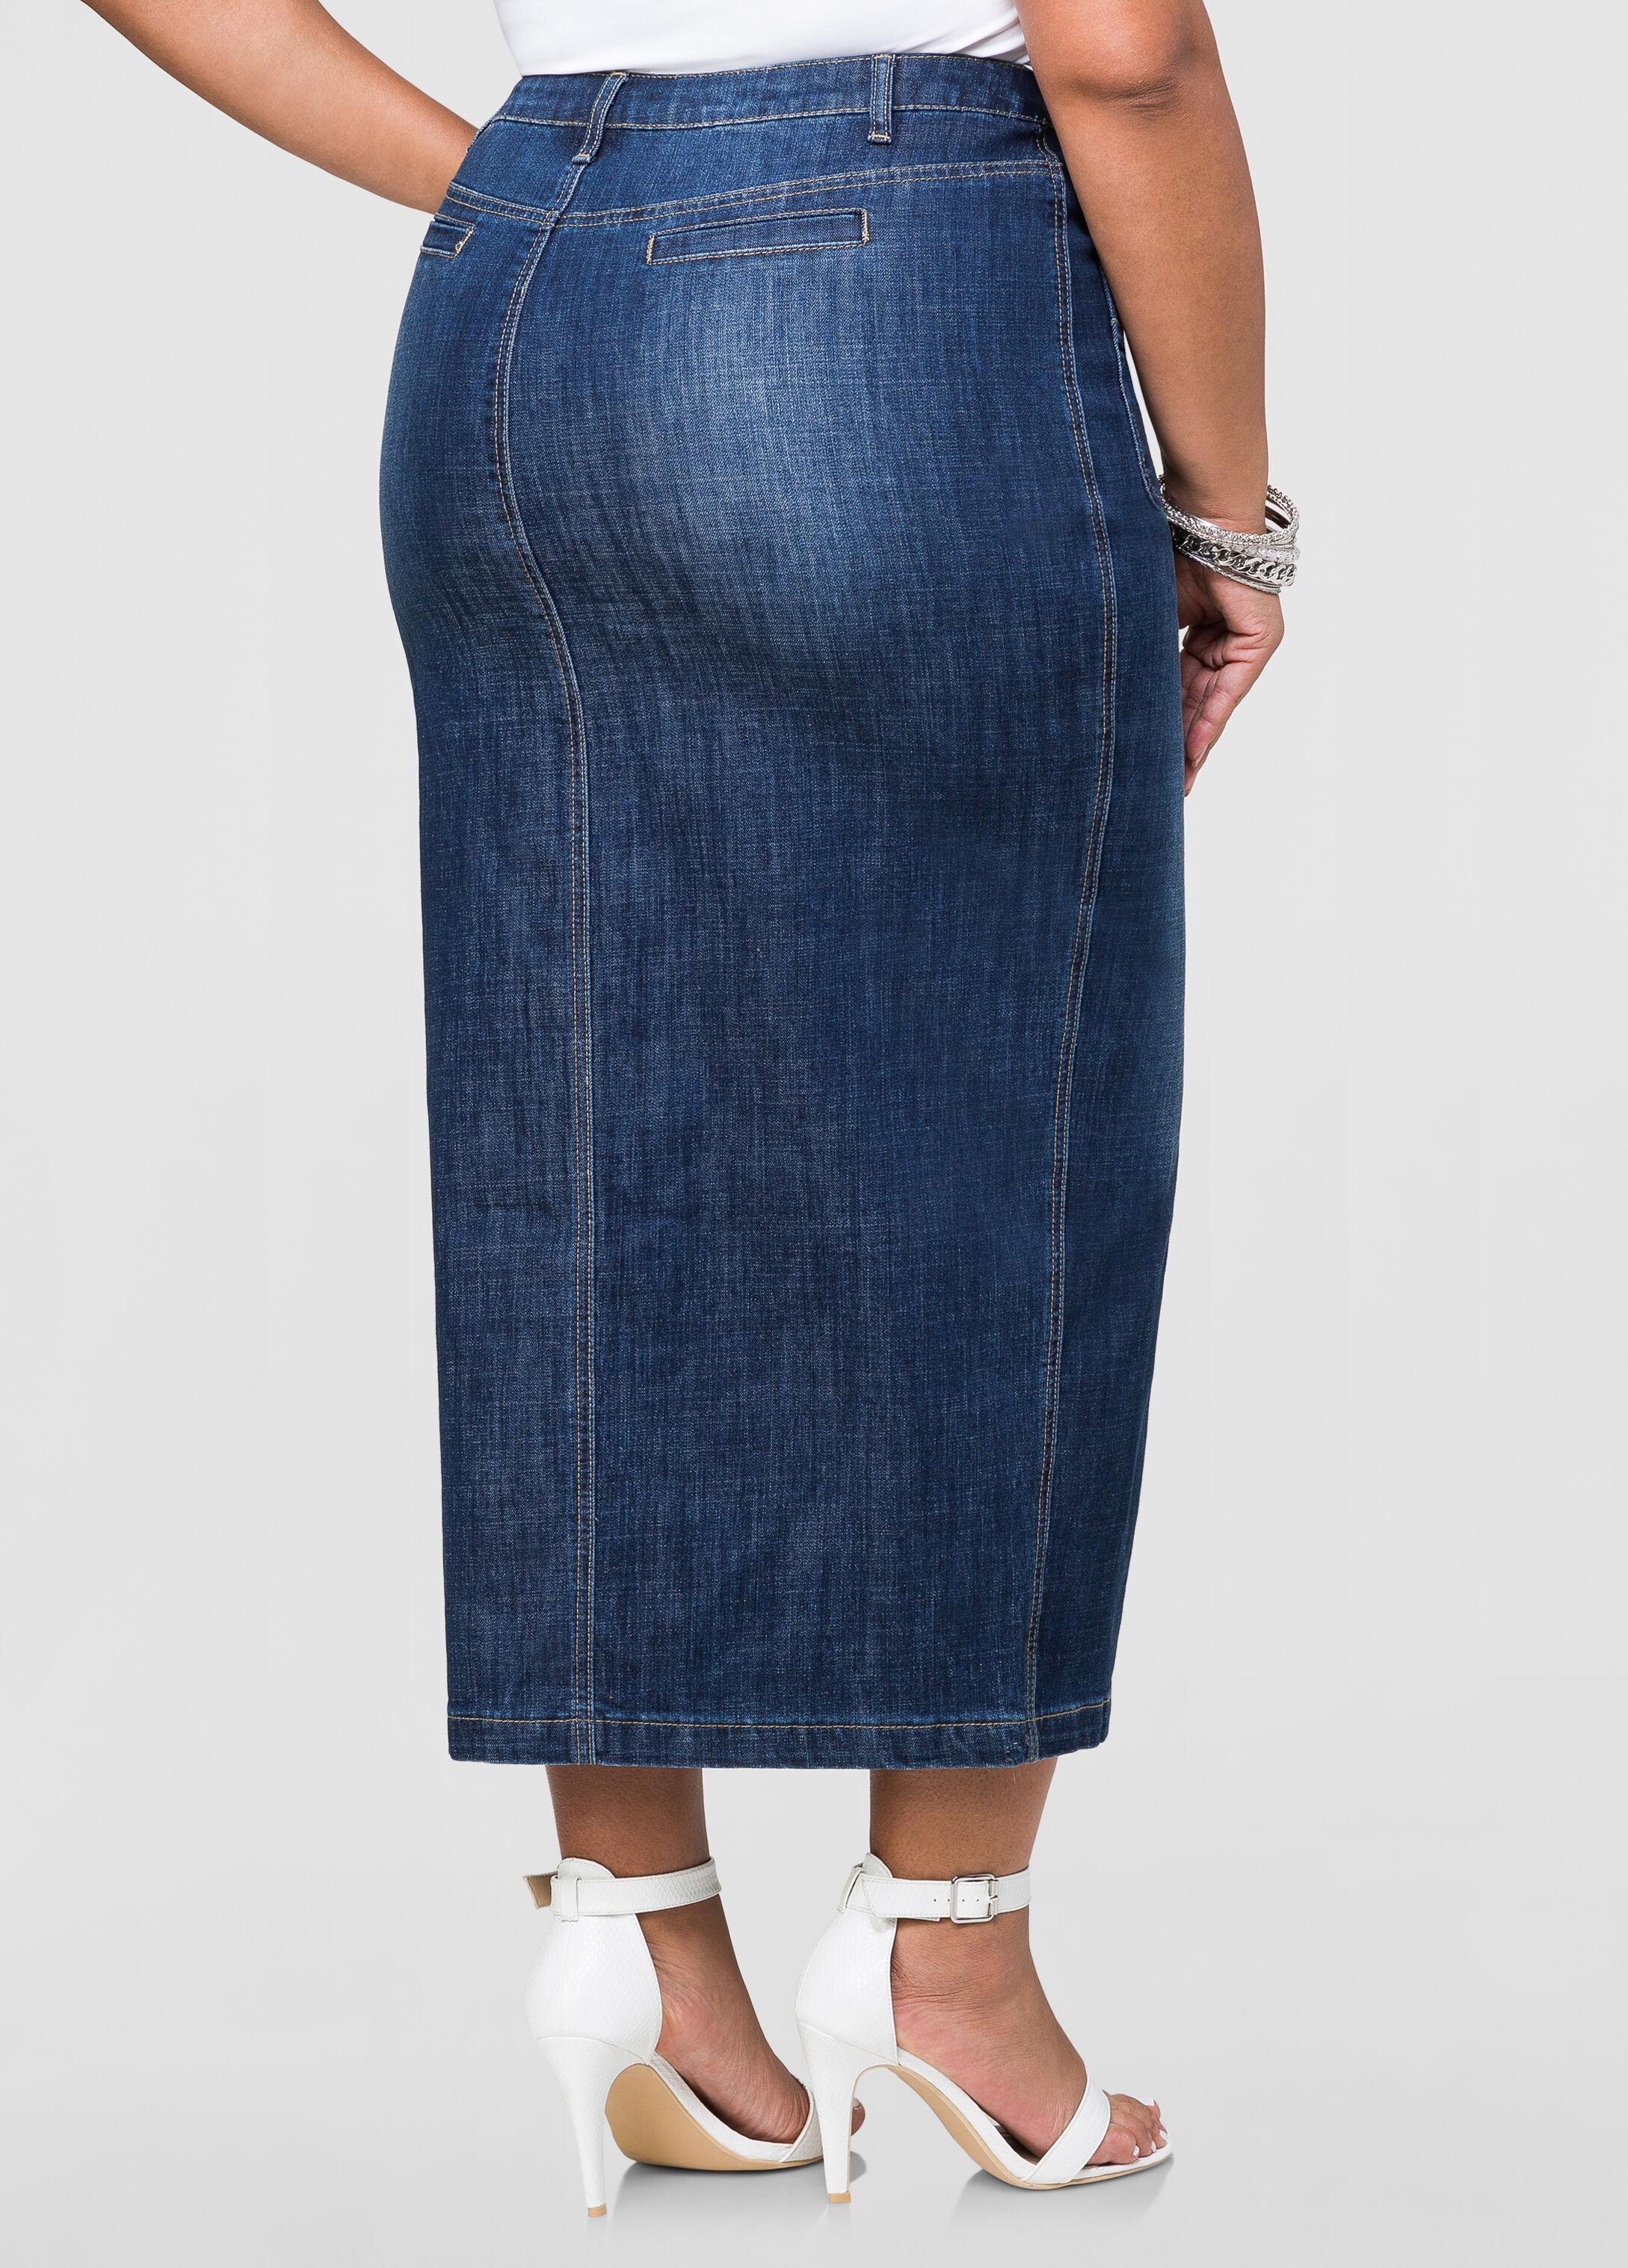 Plus Size Long Jean Skirts mRU6iLC6